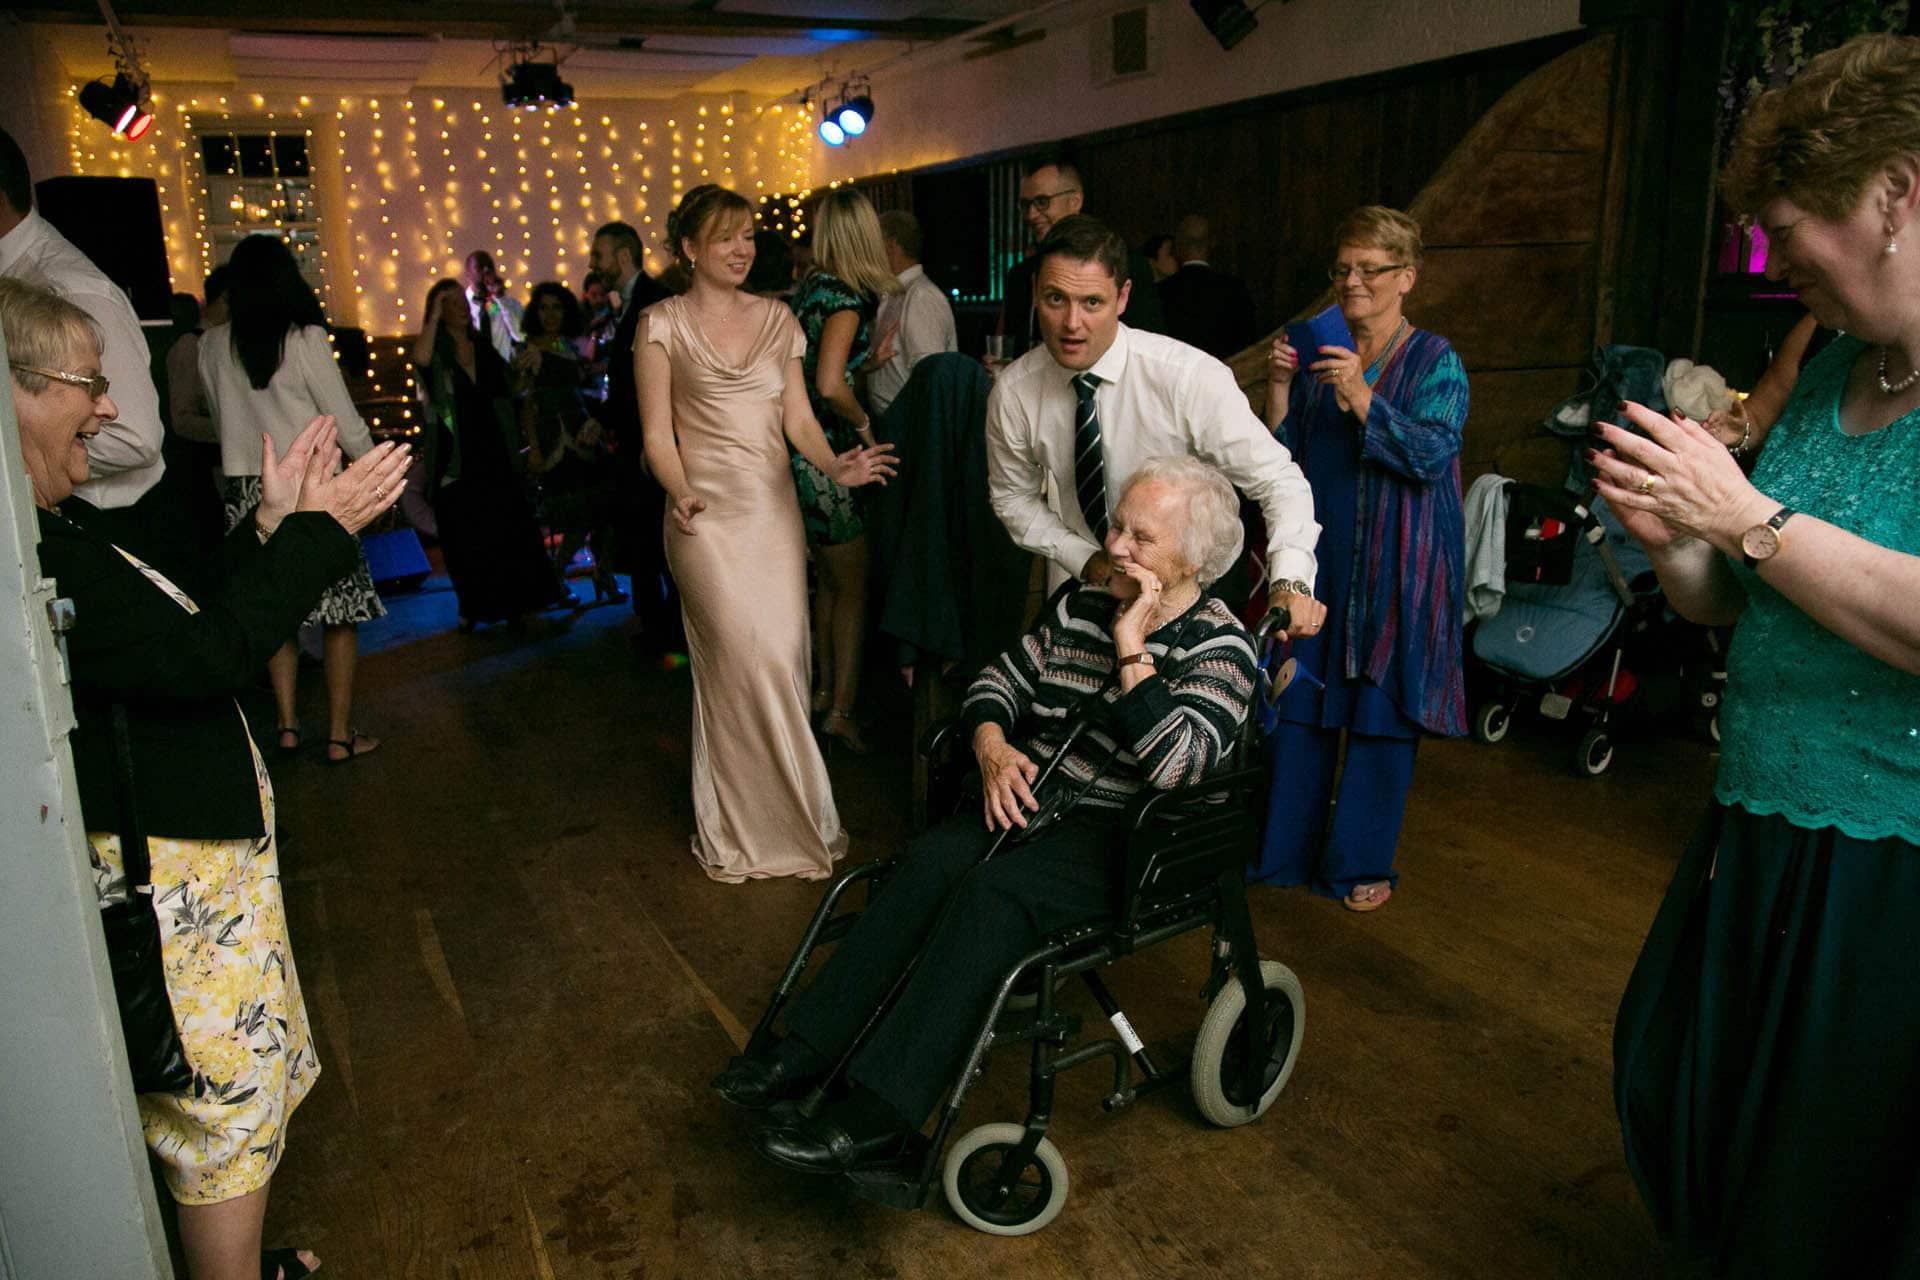 pennard-house-wedding-71